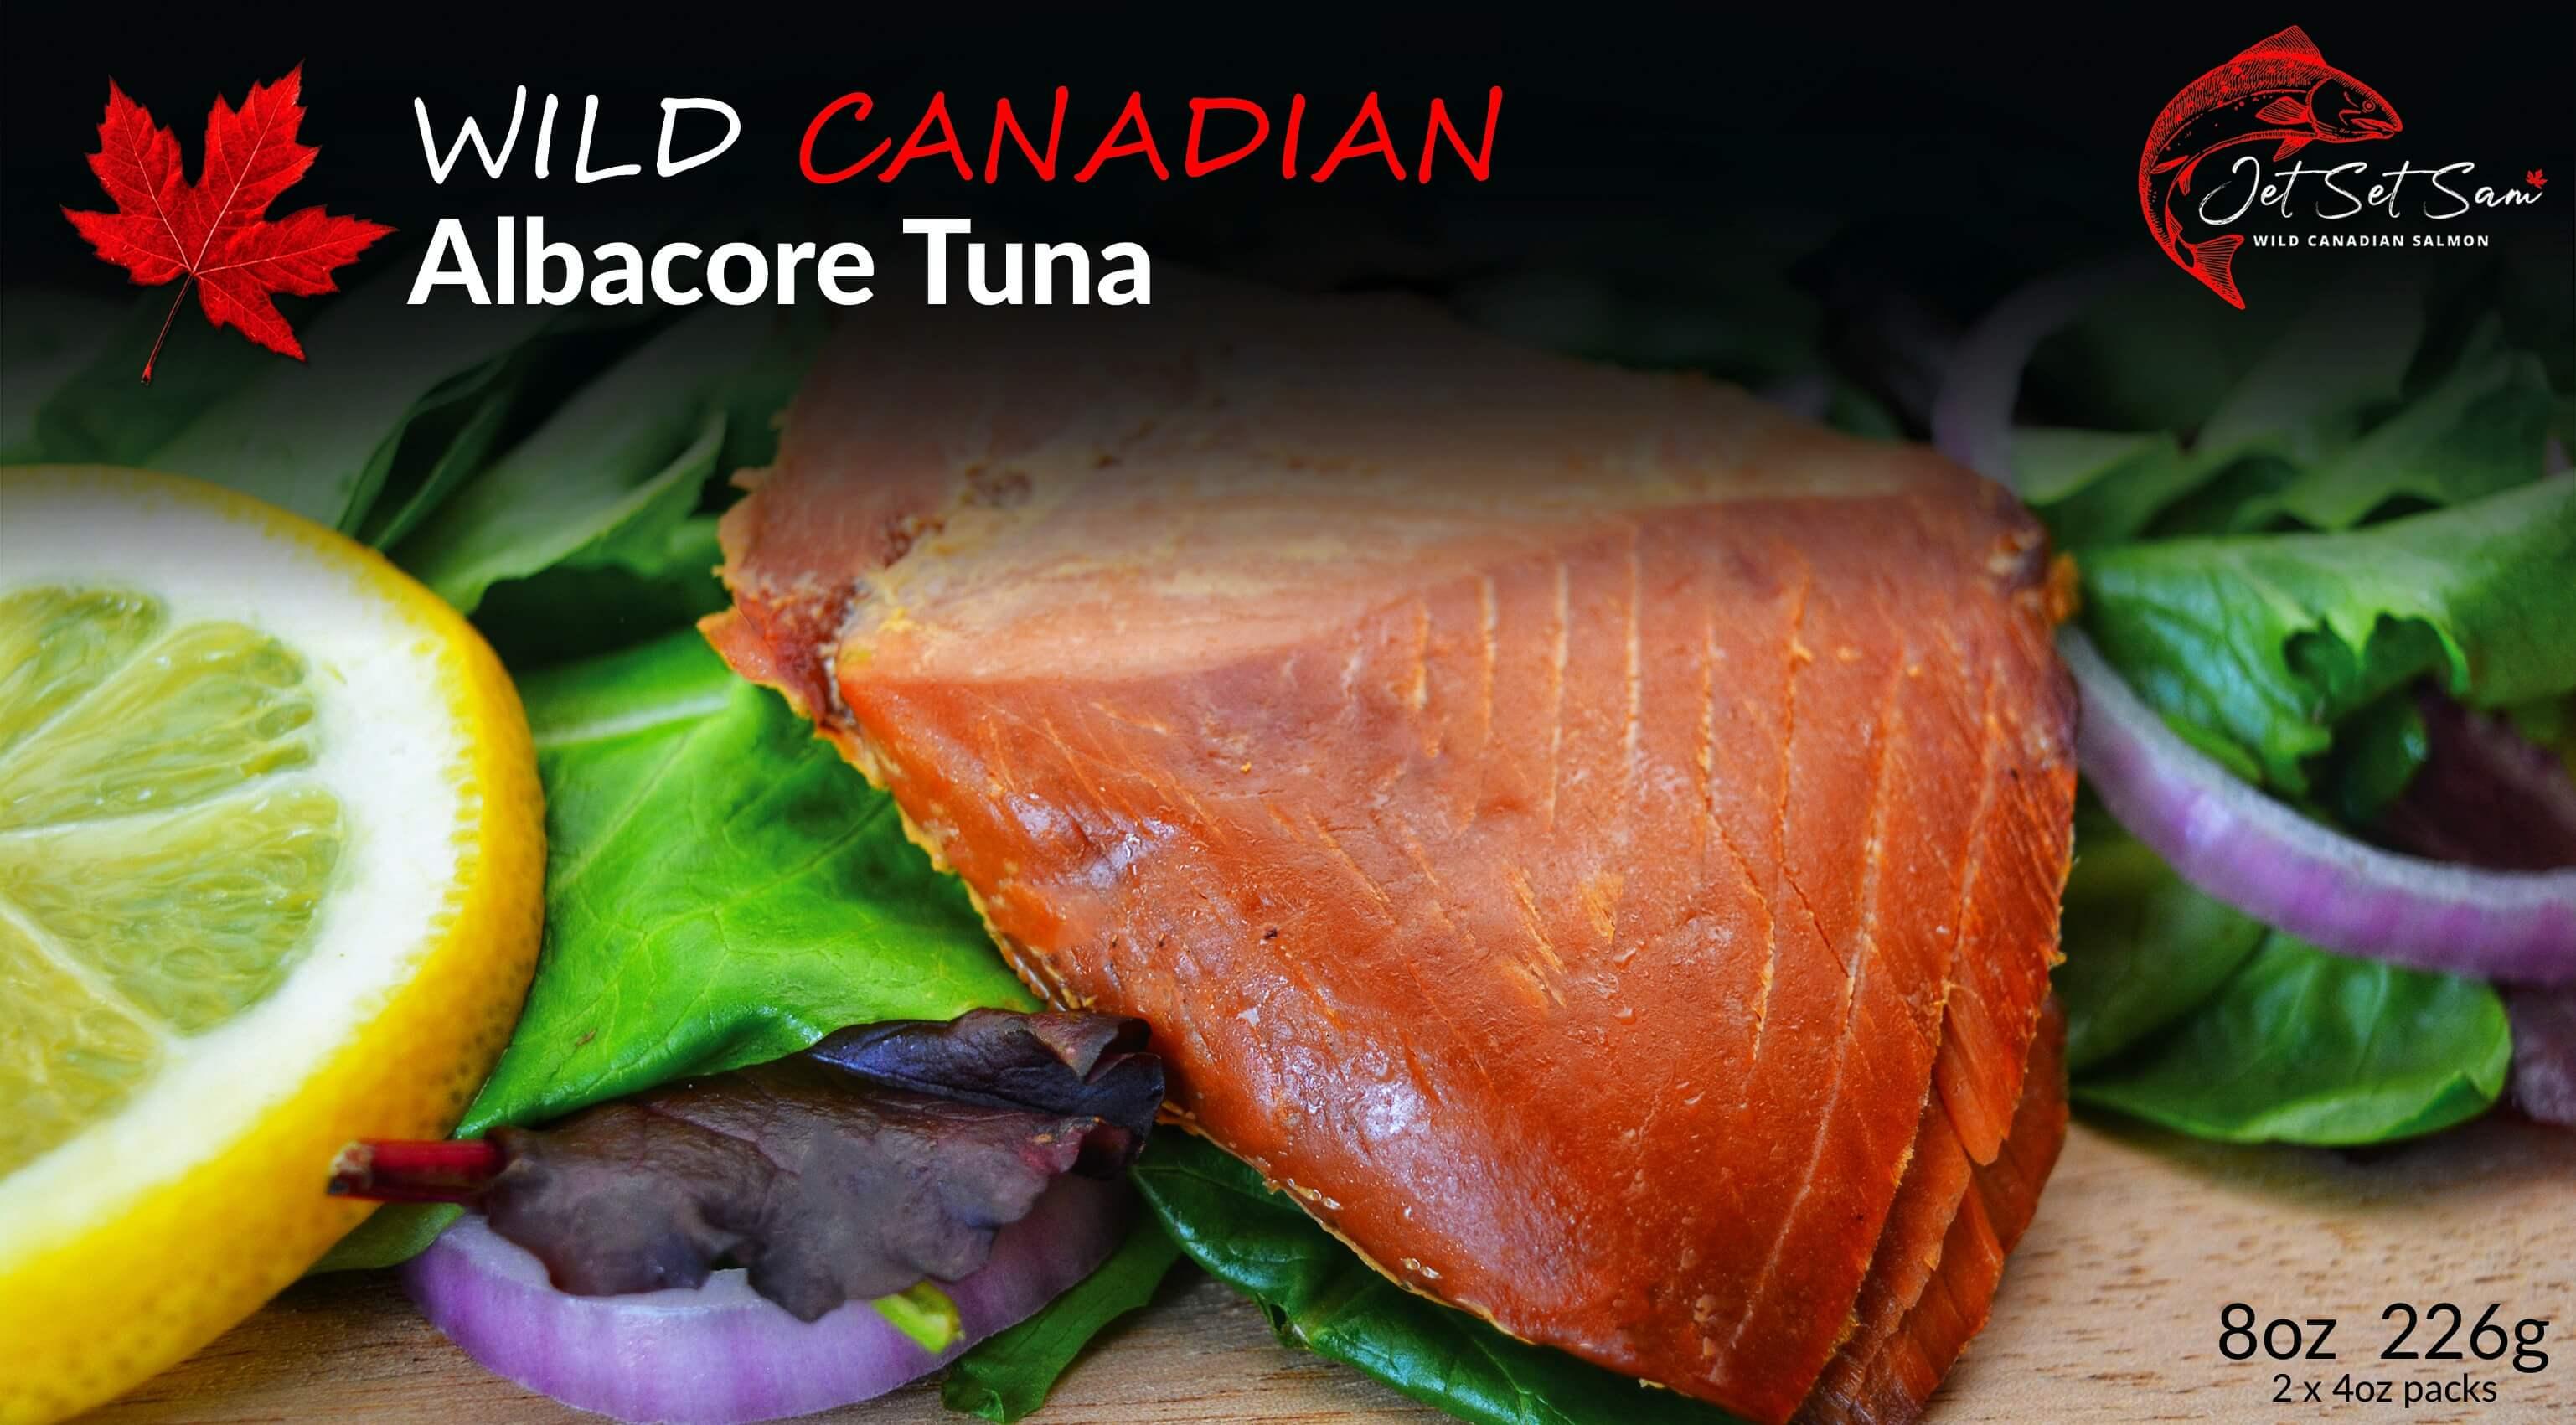 Wild Canadian Hot Smoked Albacore Tuna